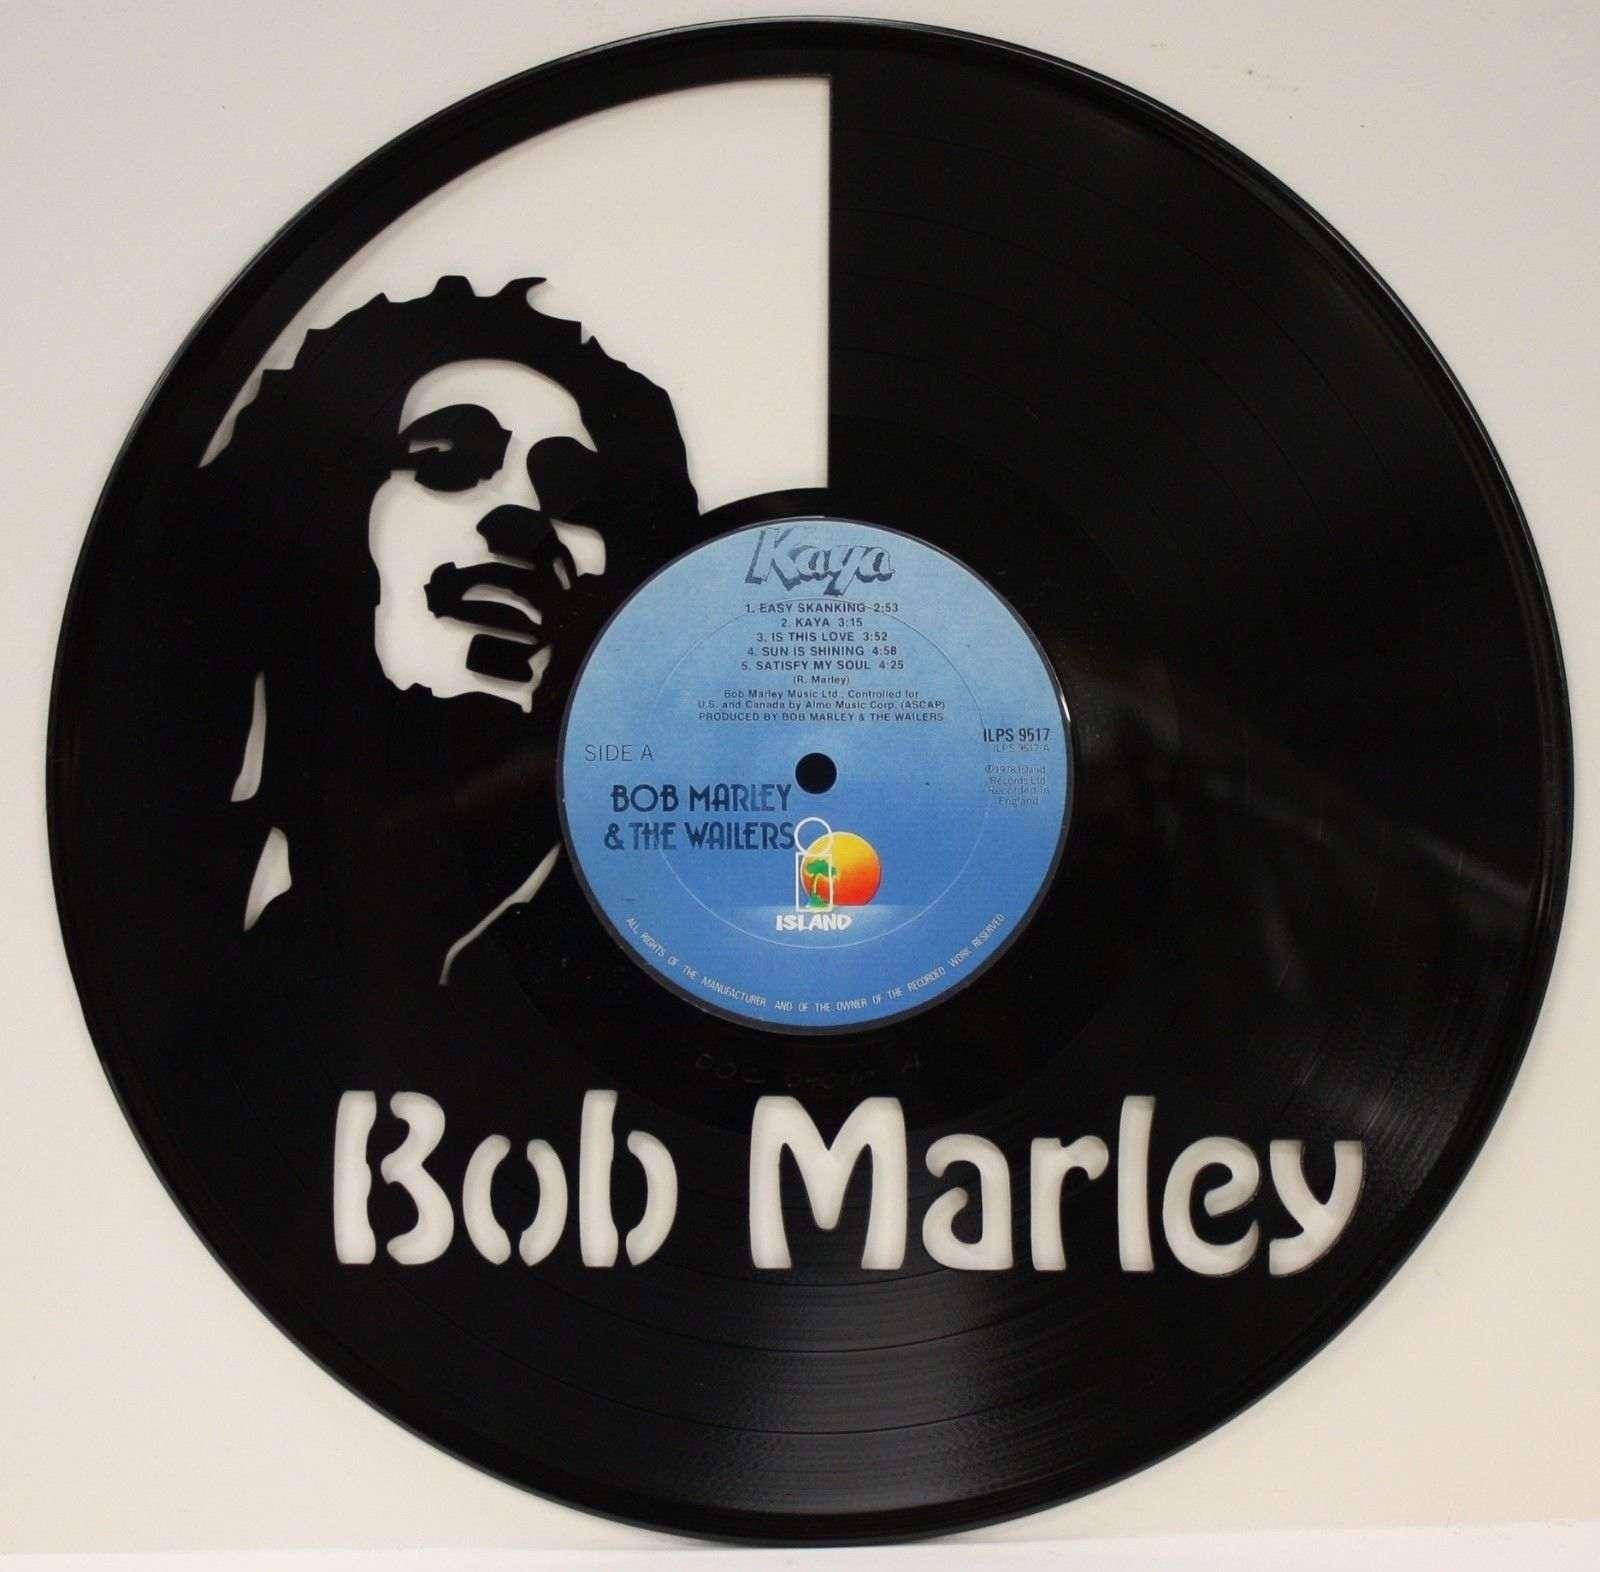 Vinyl Cover Art Book ~ Bob marley vinyl in lp record laser cut wall art display